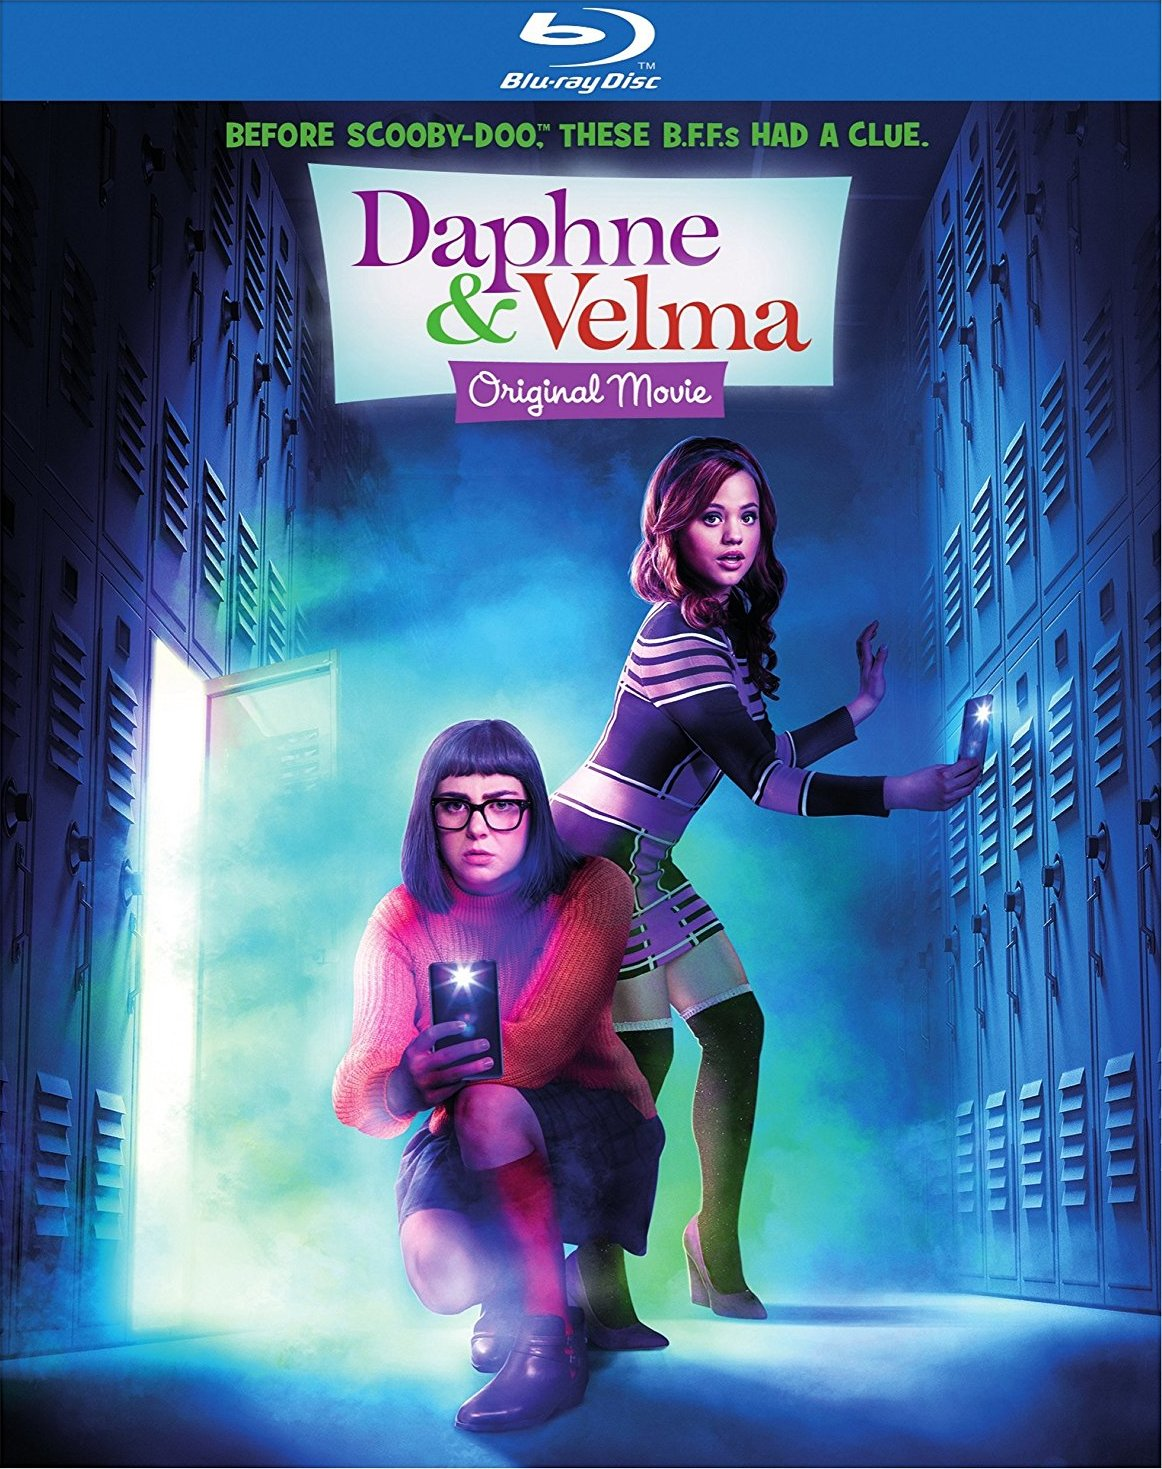 Daphne & Velma (2018) Blu-ray